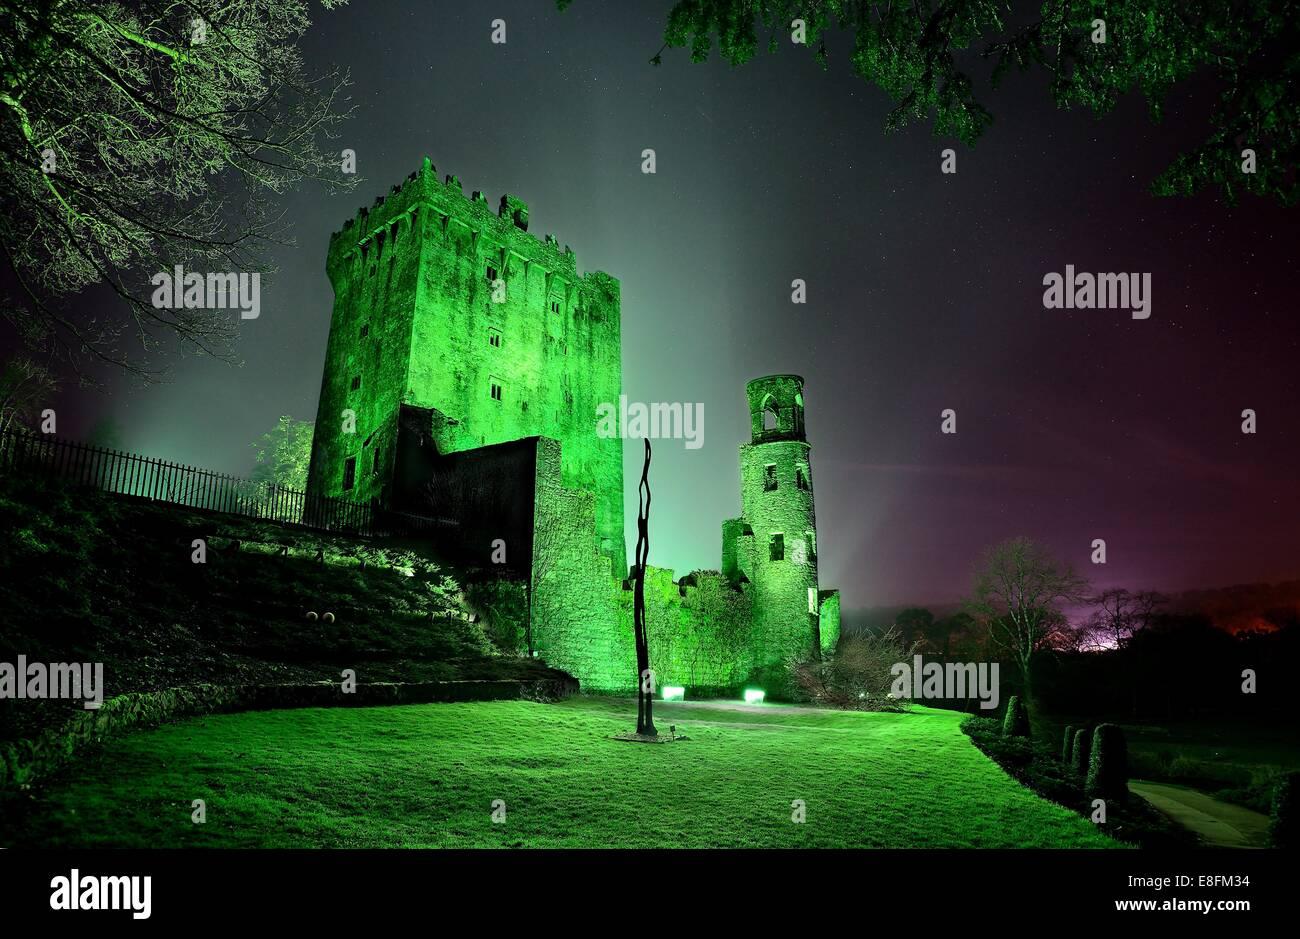 Irland, Munster, County Cork, Blarney, Blarney Castle am St. Patricks day Stockbild